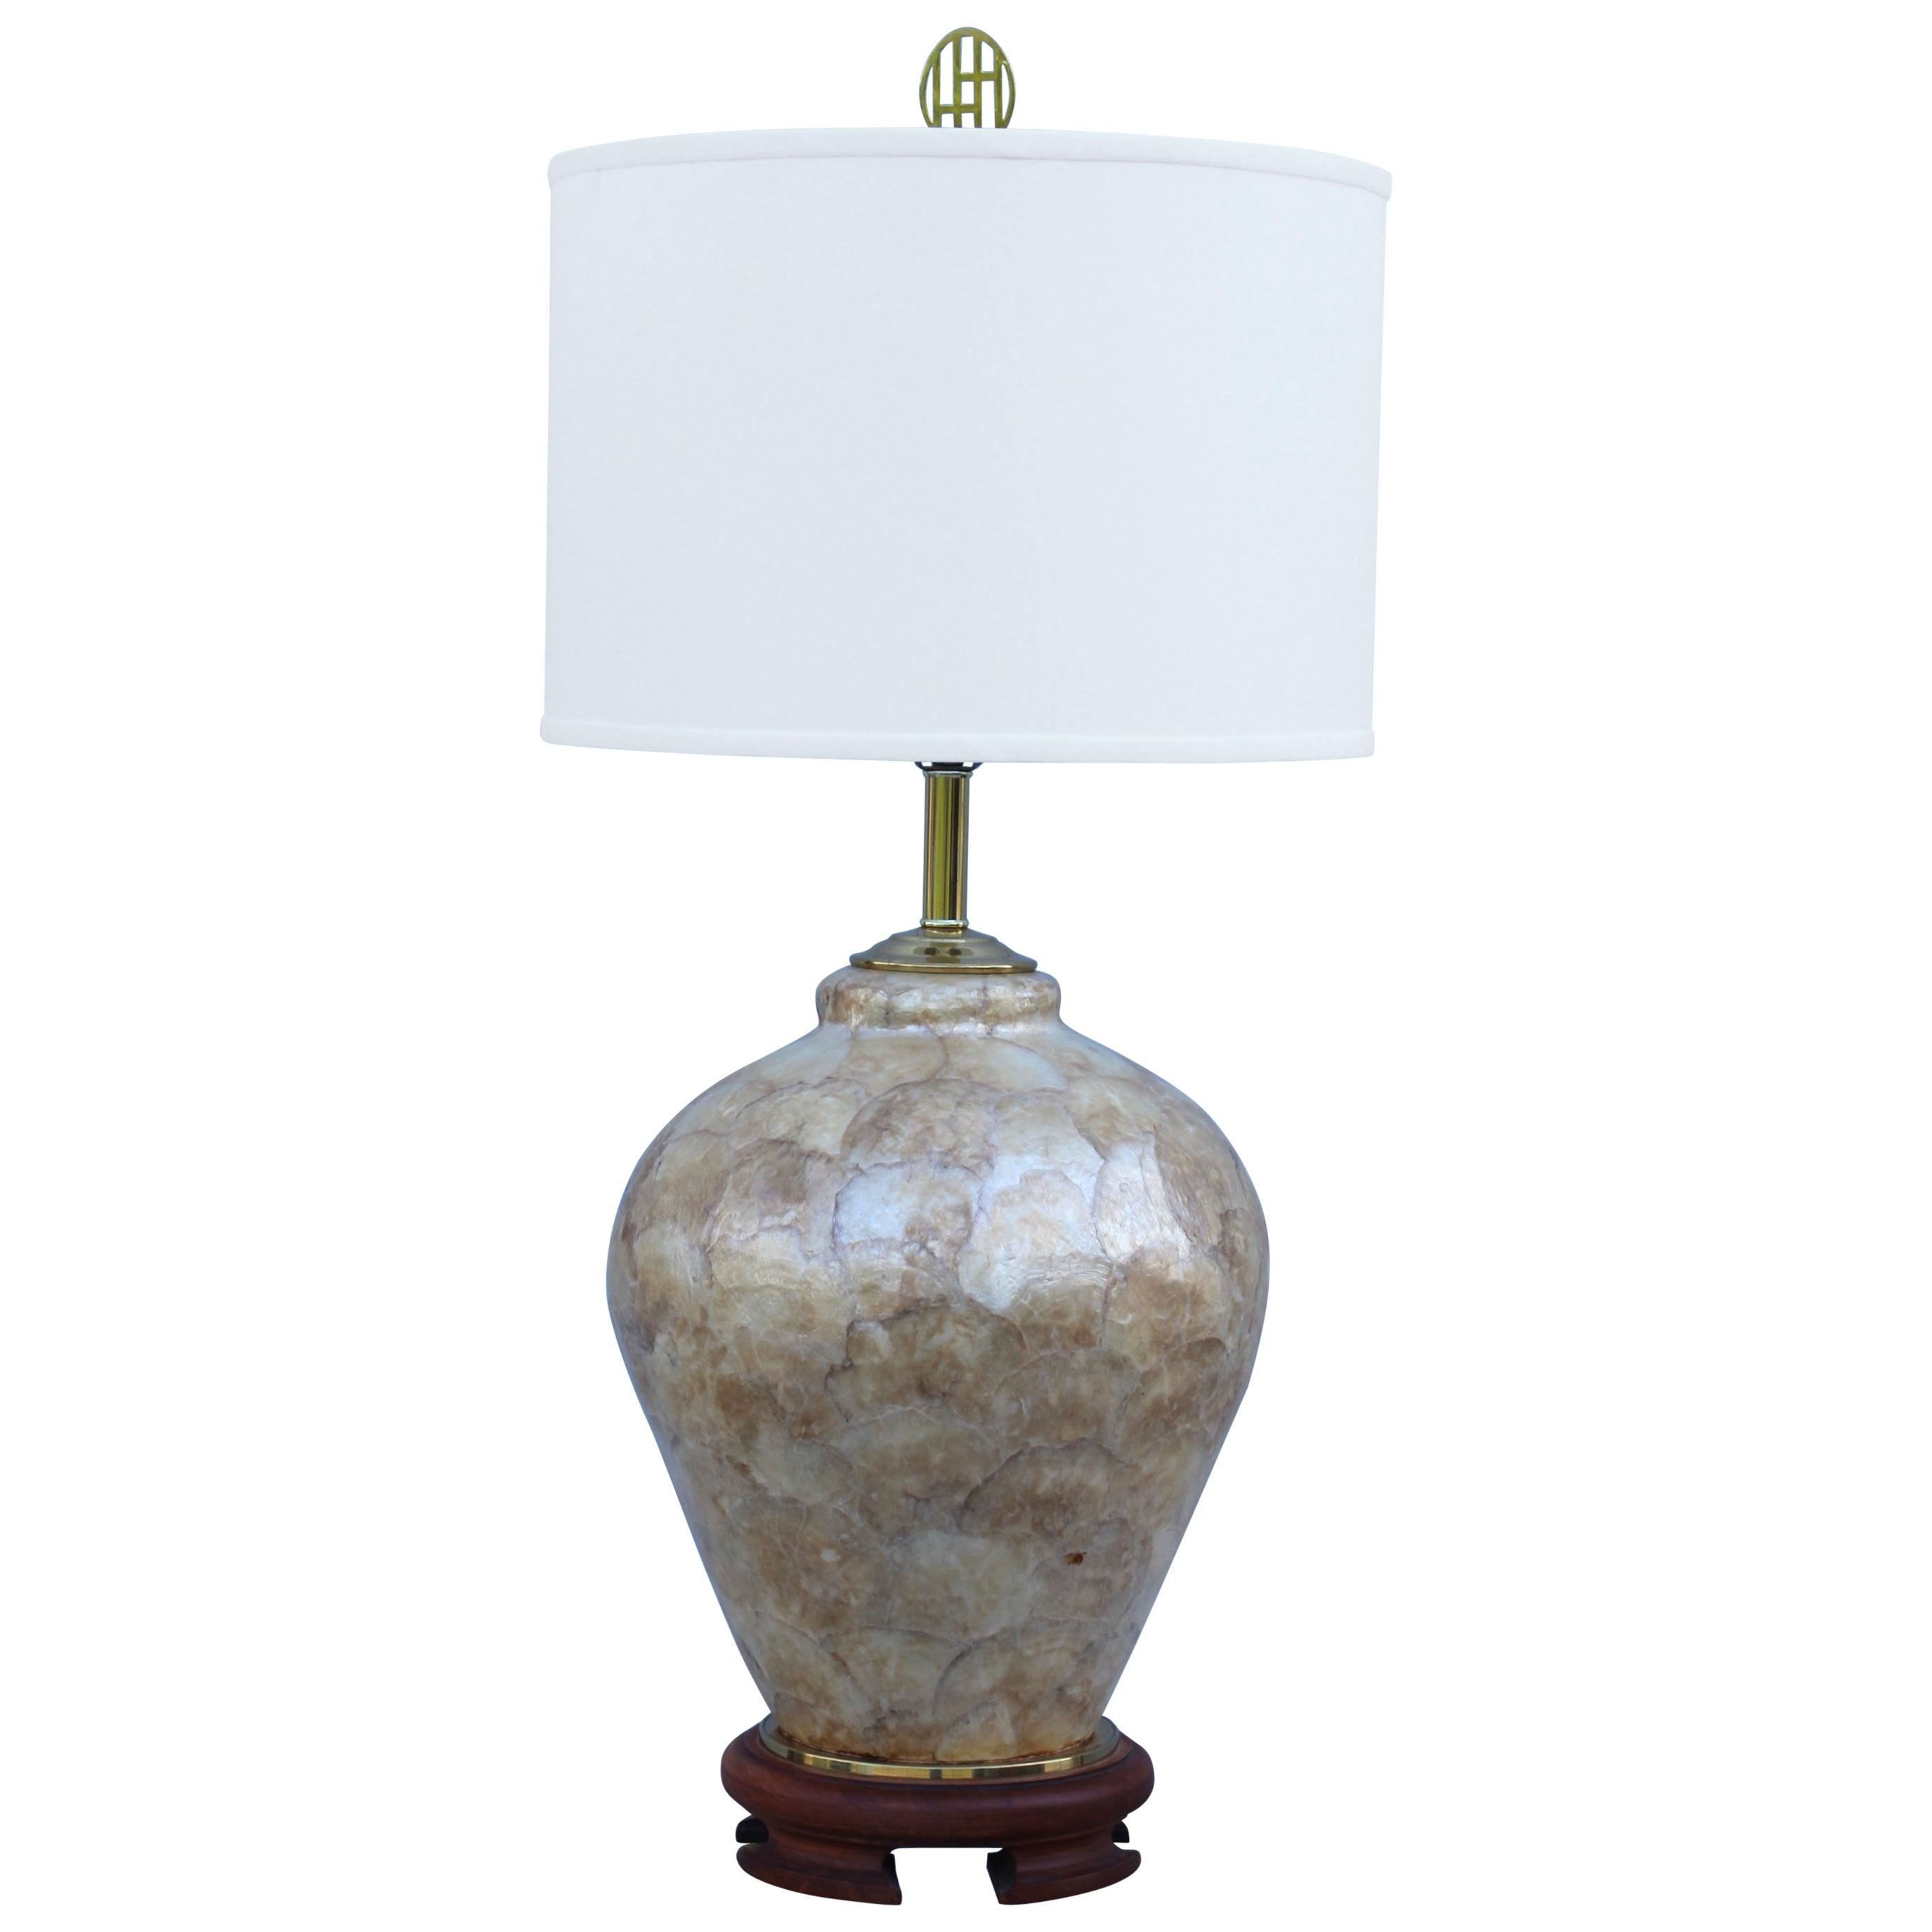 1970s Capiz Shell Table Lamp